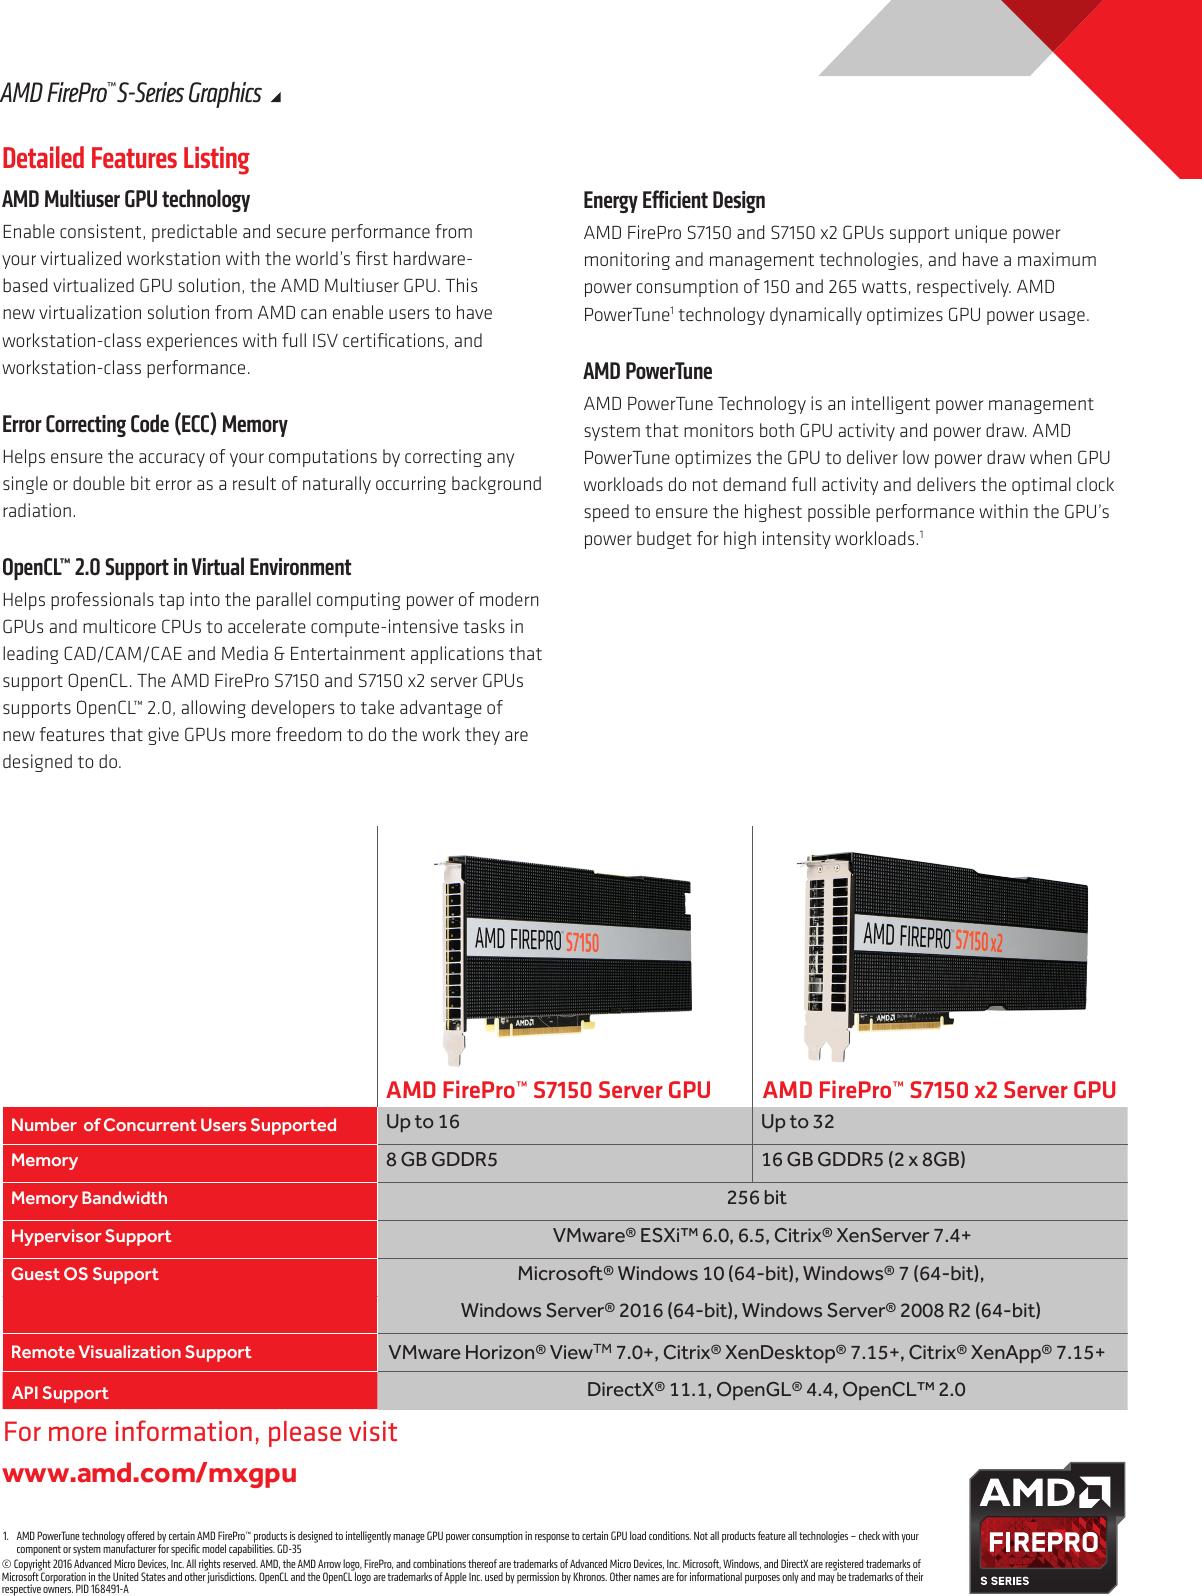 AMD Fire PRO S7150 Data Sheet